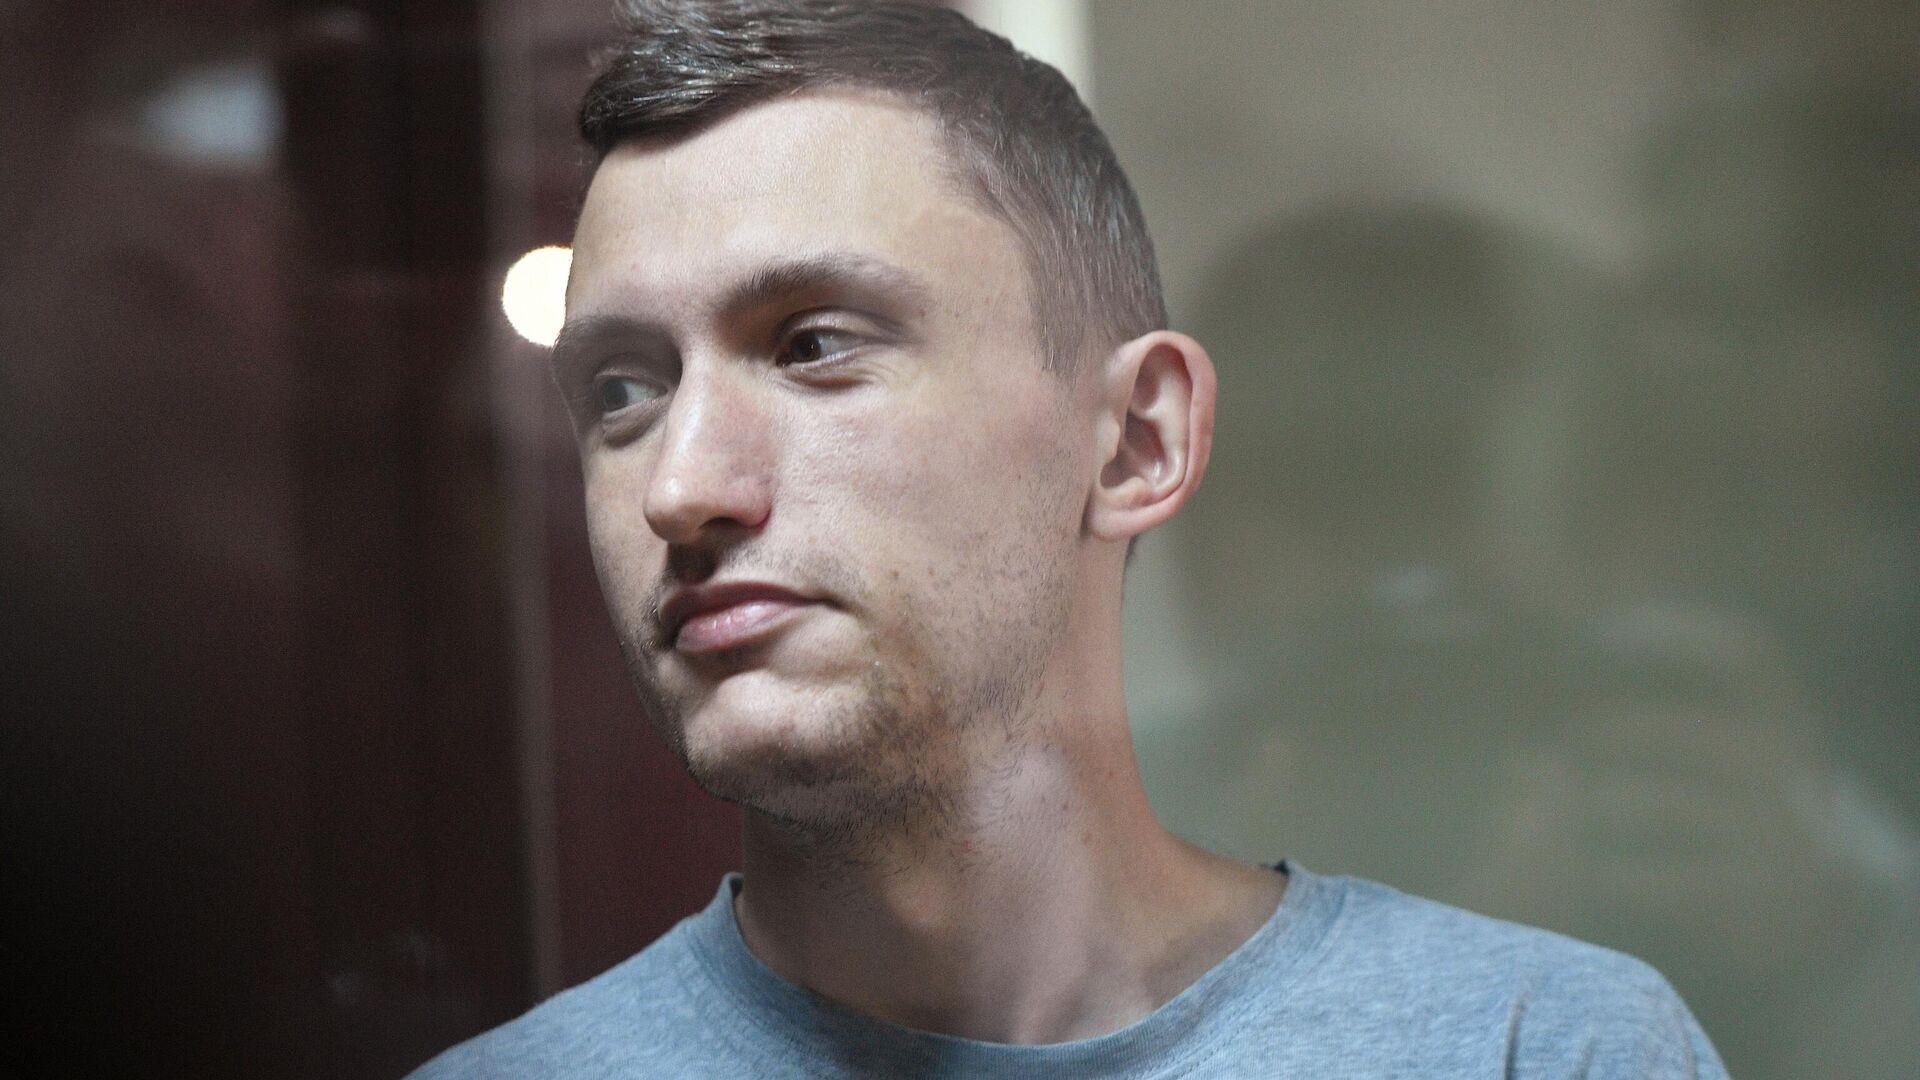 В Москве пропал ранее судимый за нарушения на митингах Константин Котов